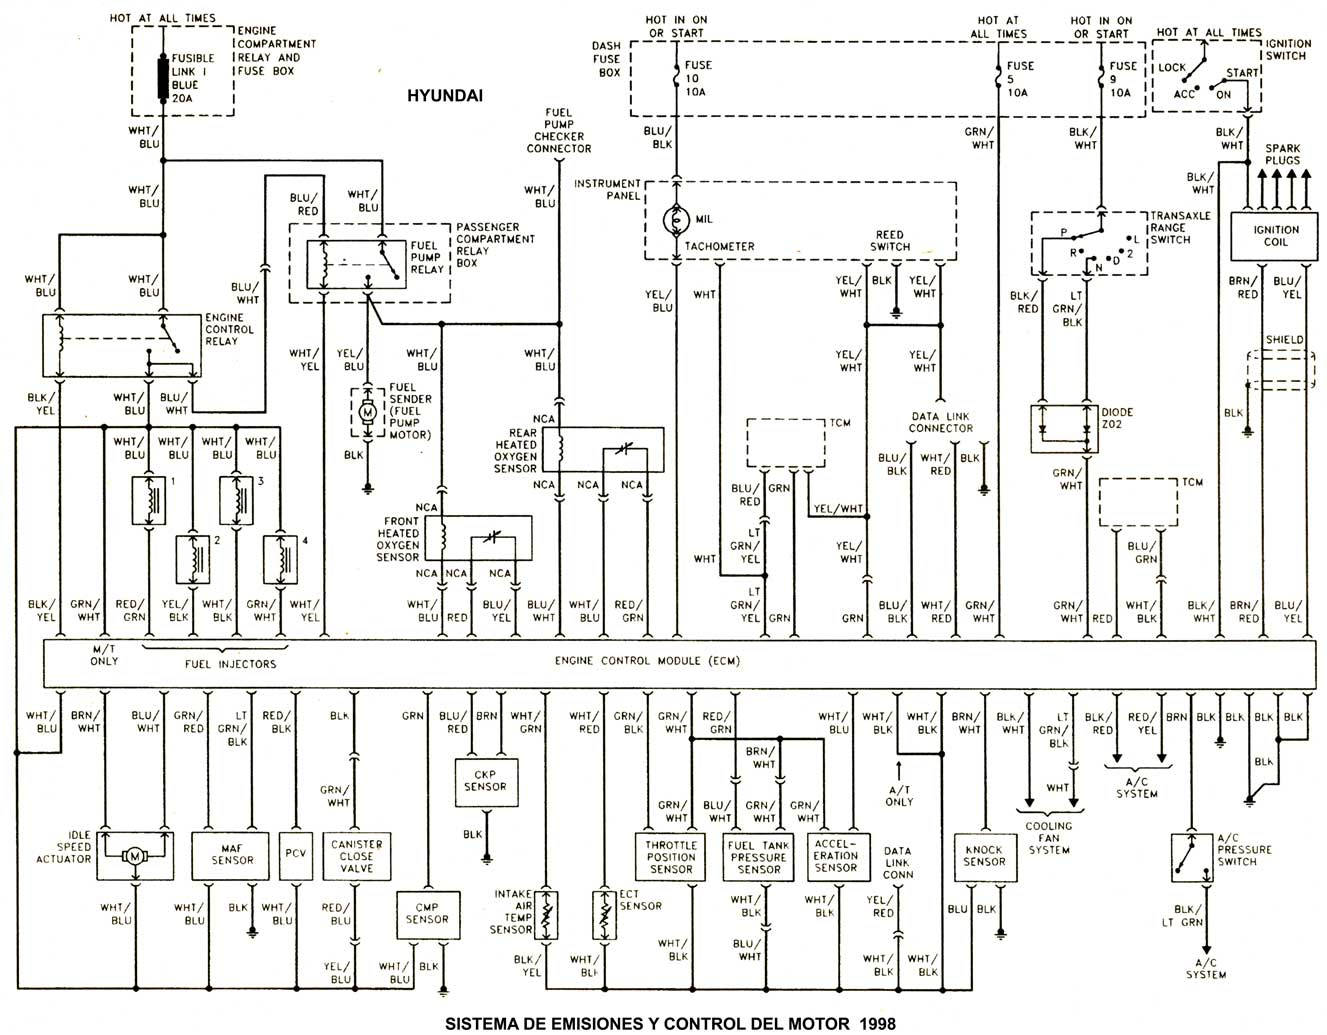 koenigsegg diagrama de cableado abanico